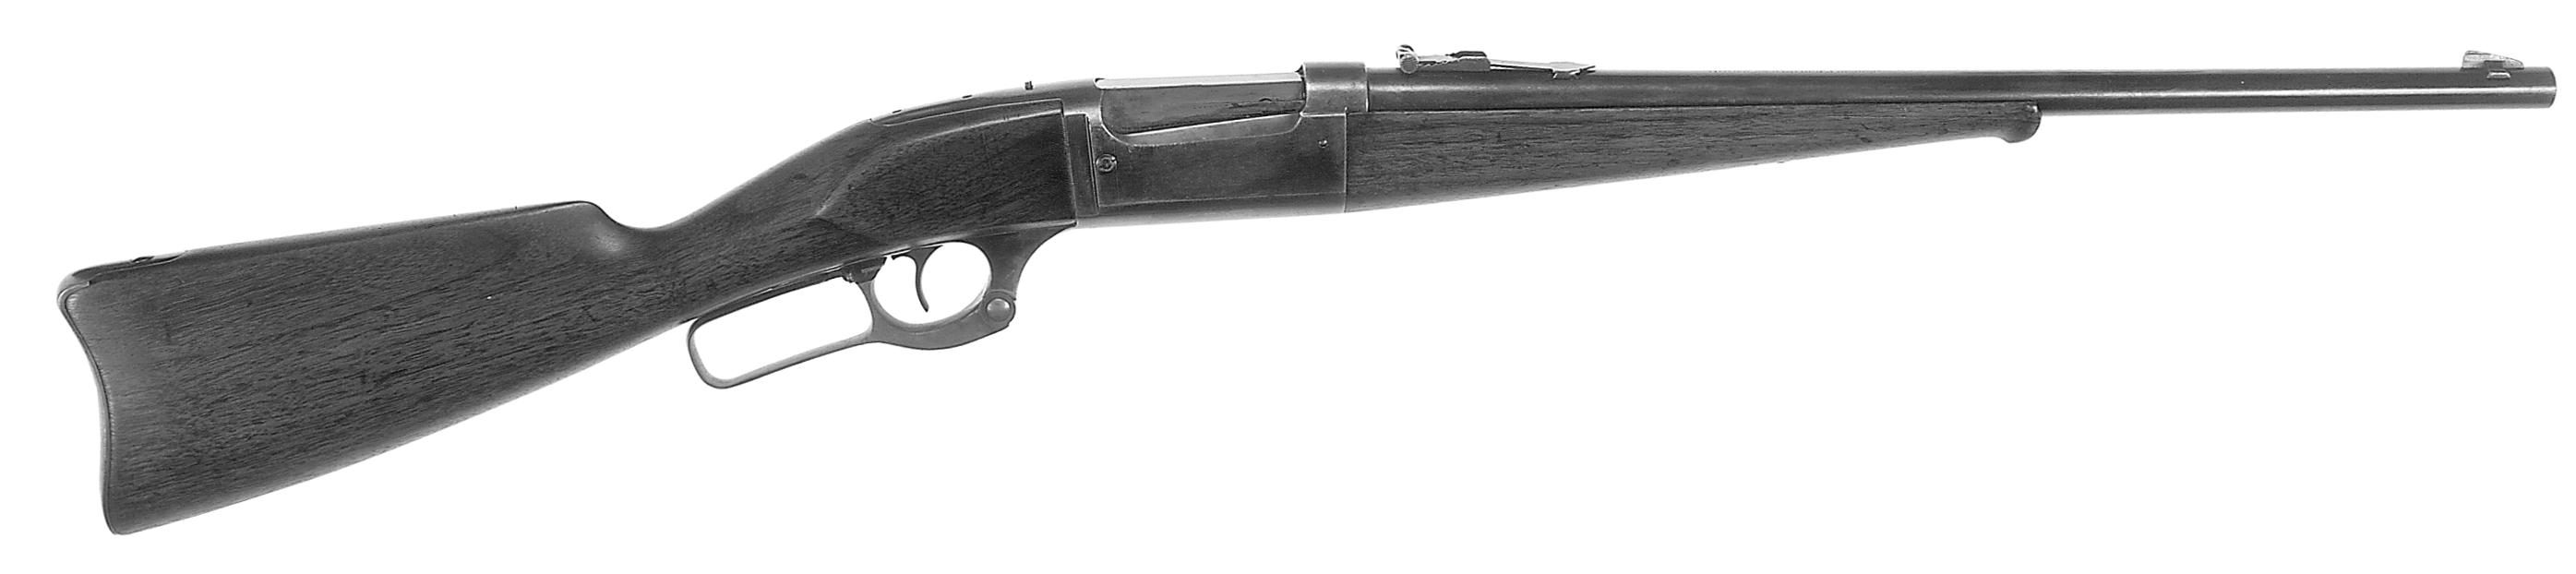 Model 1899-F Saddle Ring Carbine